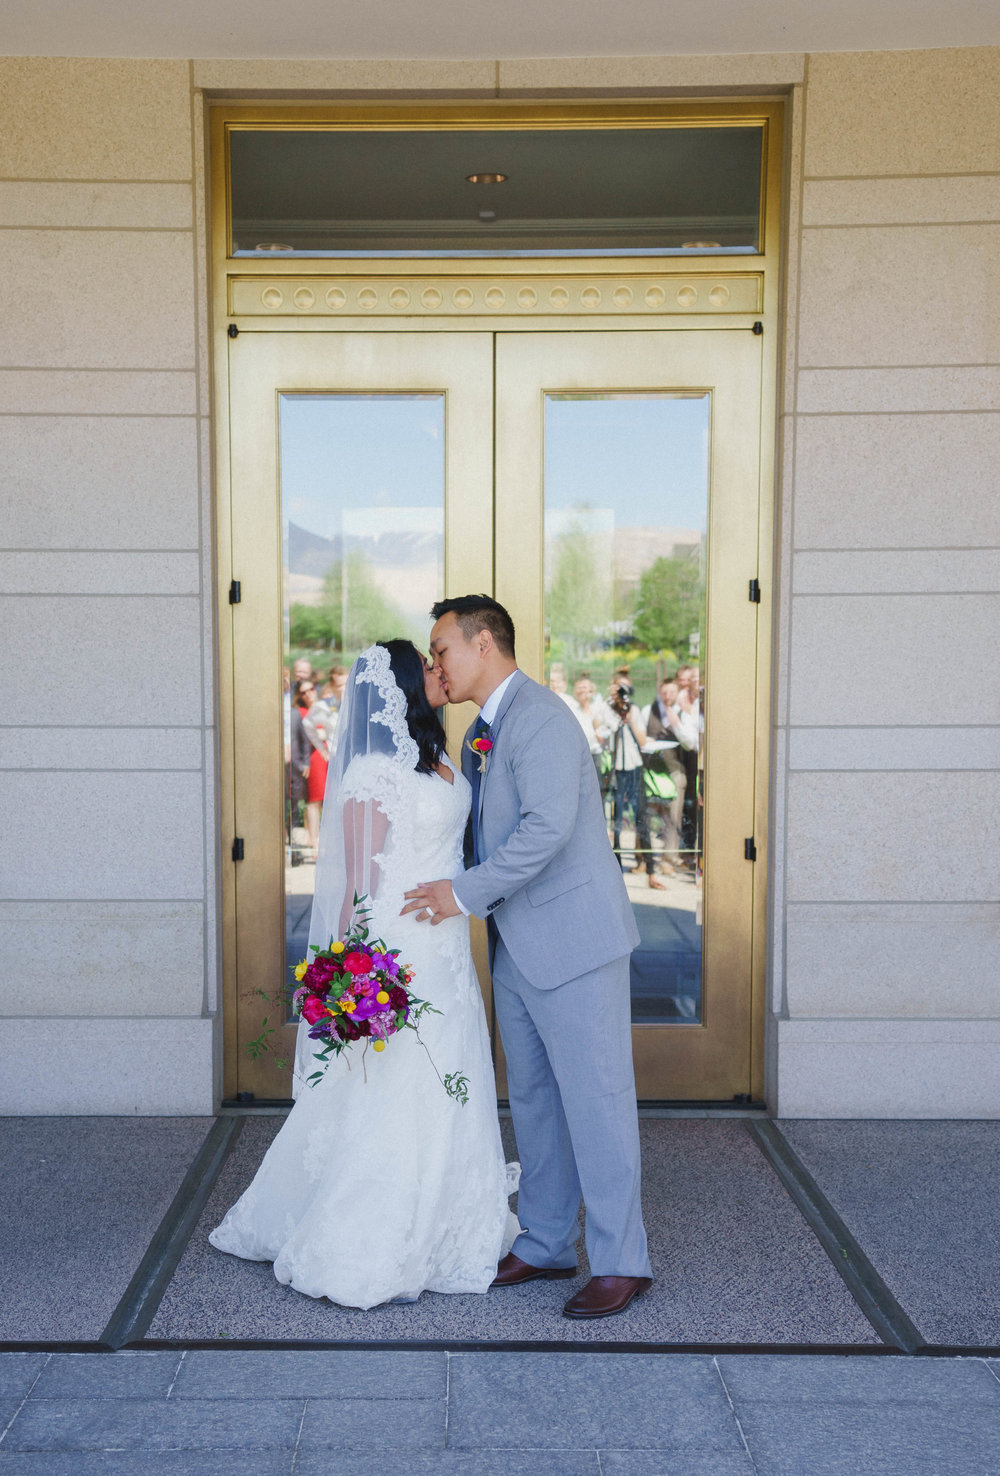 RnP+Lim+Wedding+(6)-2.jpg